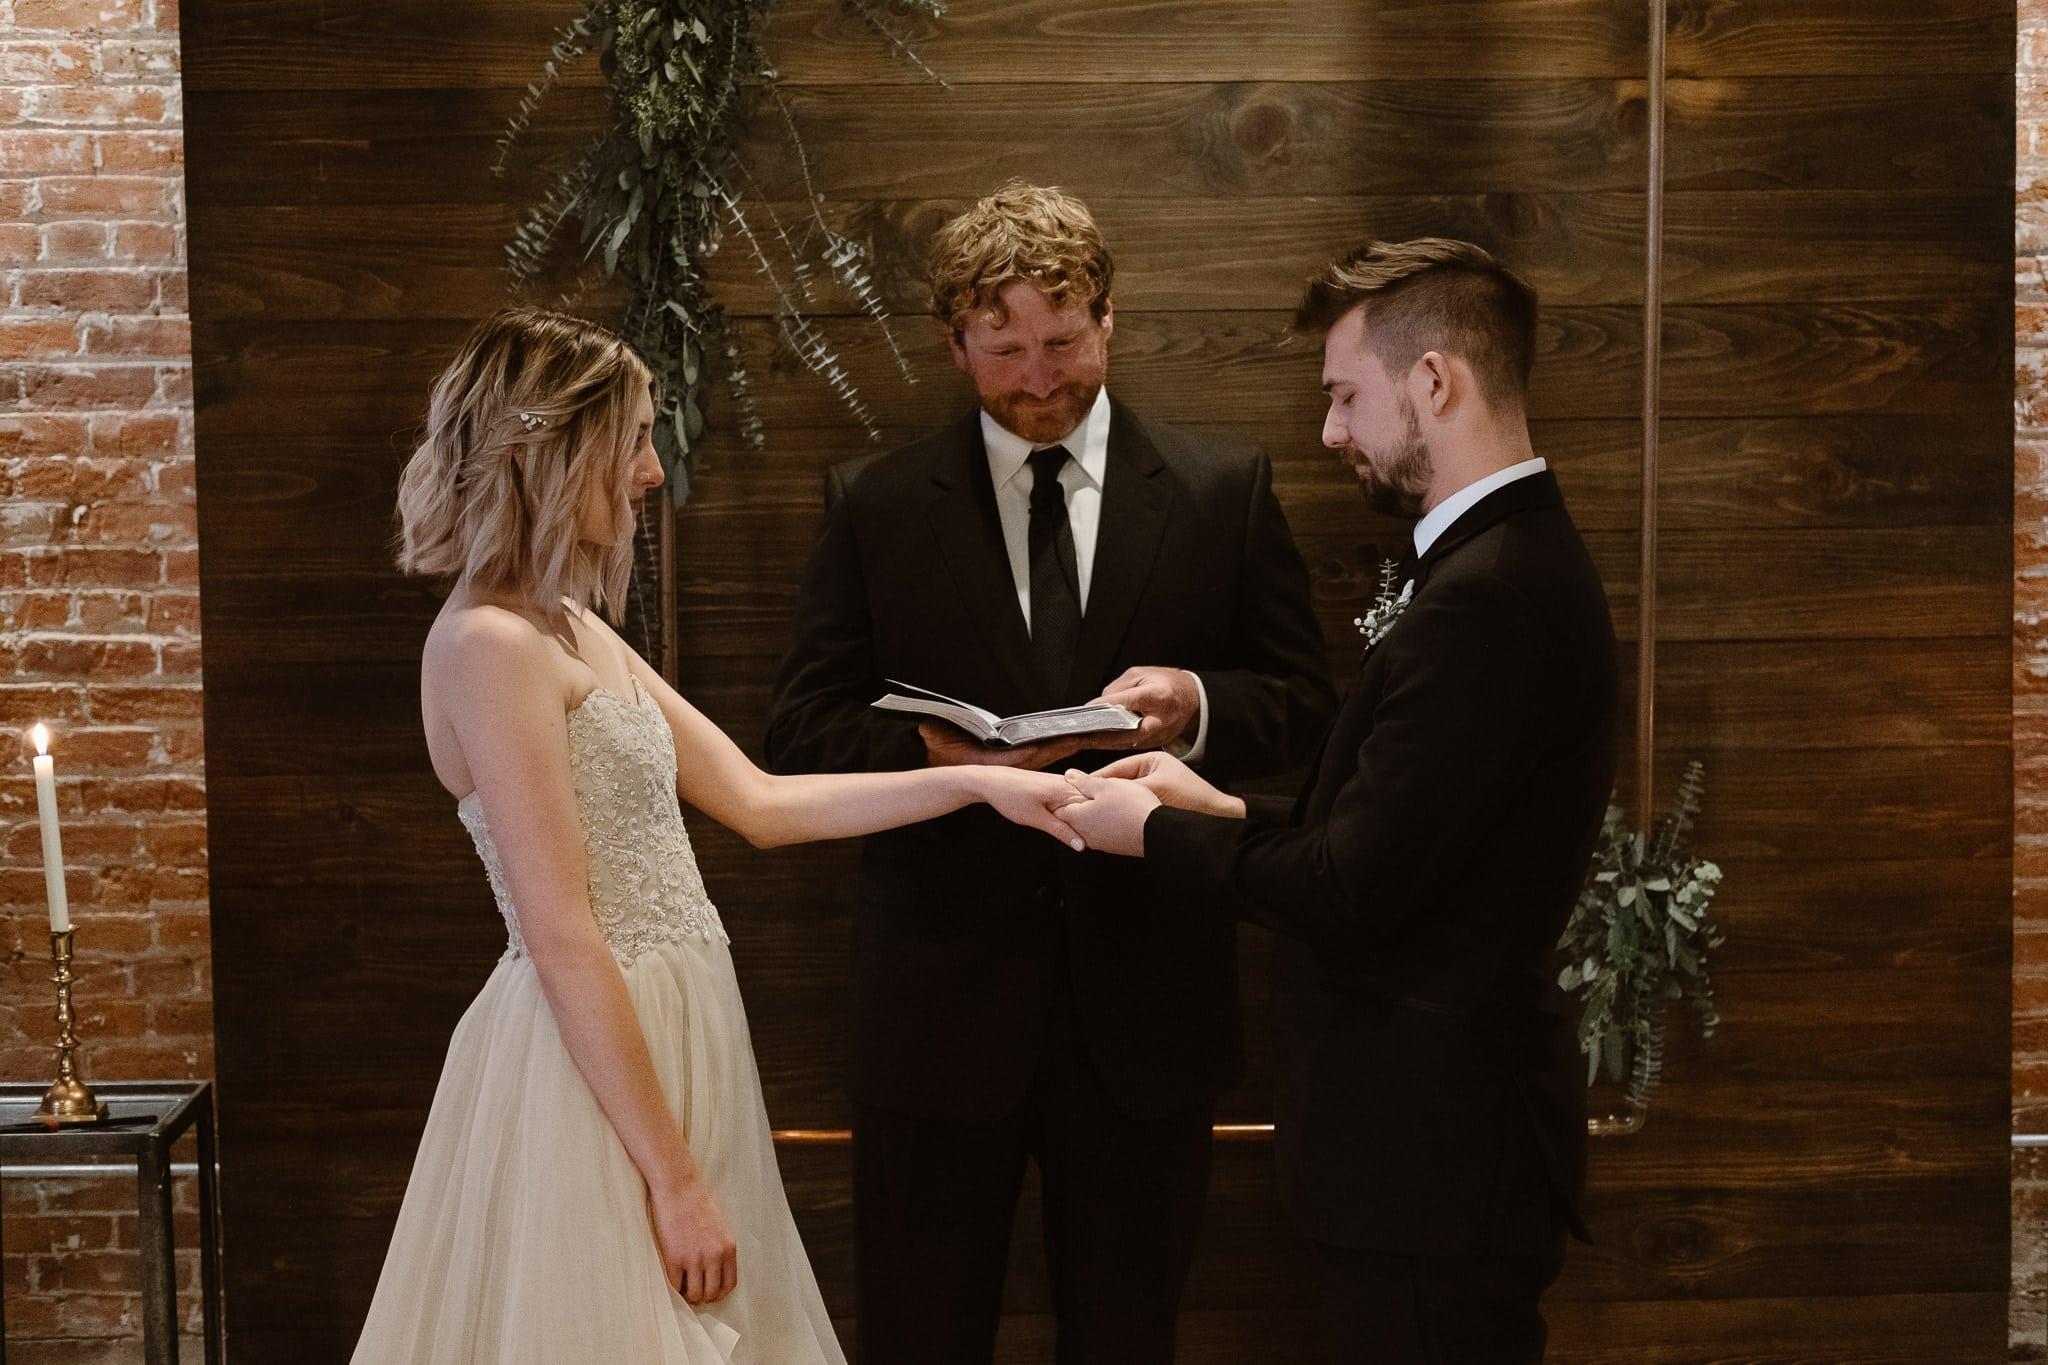 St Vrain Wedding Photographer   Longmont Wedding Photographer   Colorado Winter Wedding Photographer, Colorado industrial chic wedding ceremony, wedding ring exchange